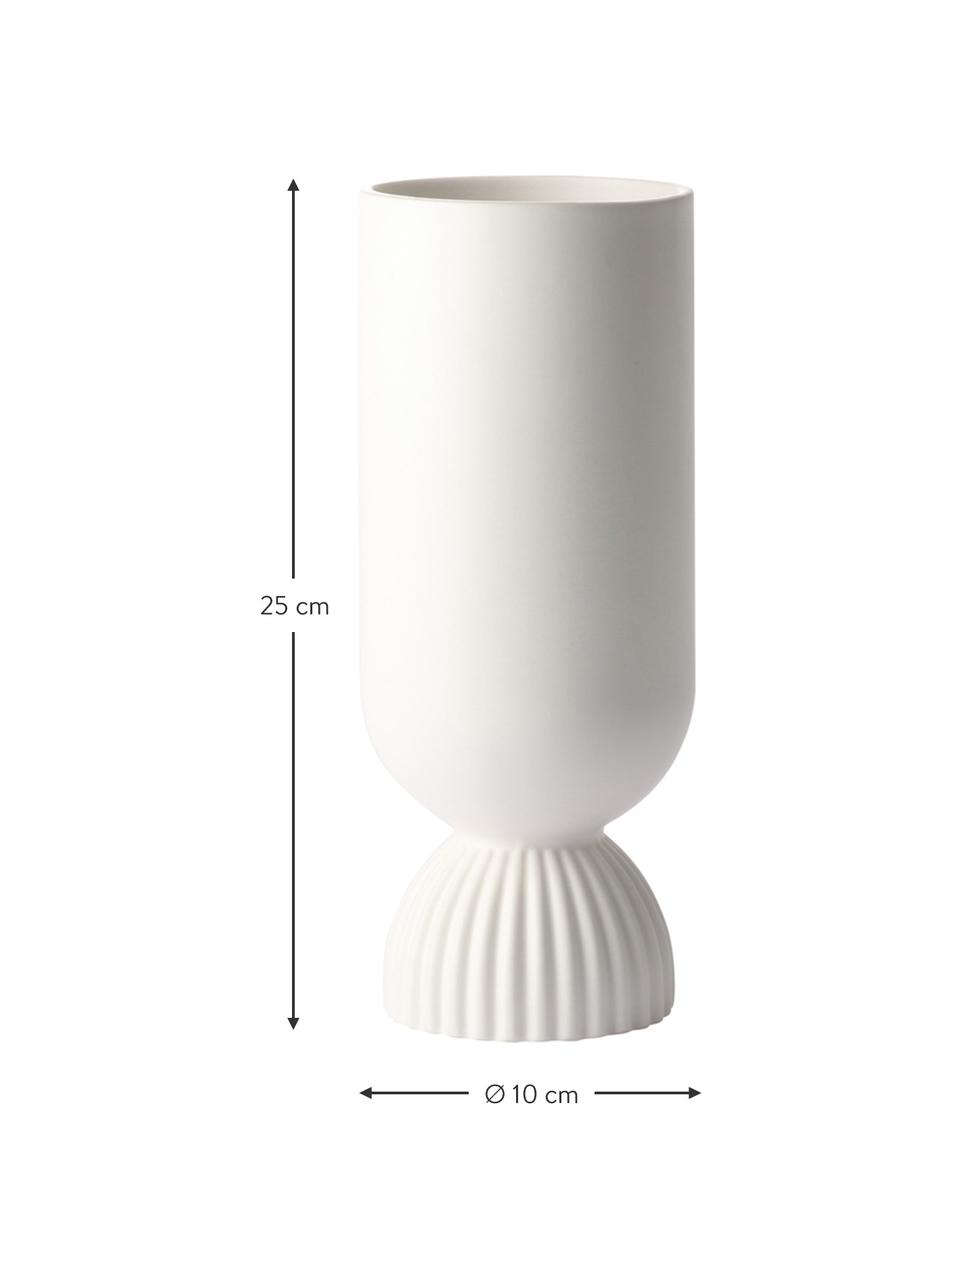 Váza Flower, Matná bílá